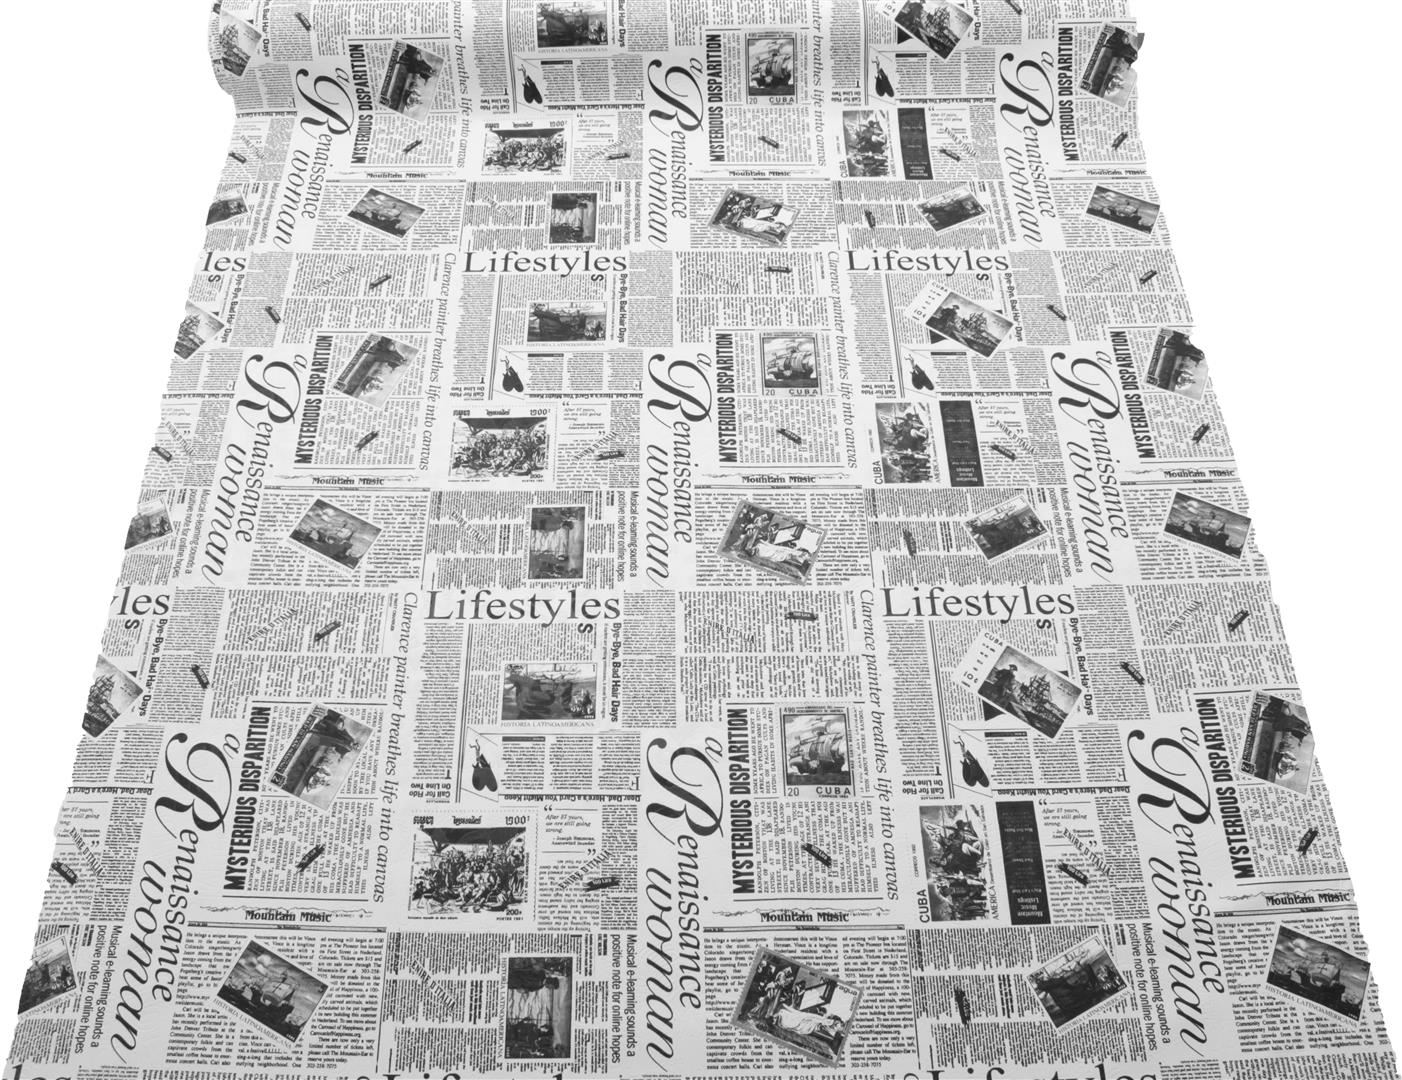 Designer Vintage Retro Newspaper Print Faux Leather Vinyl